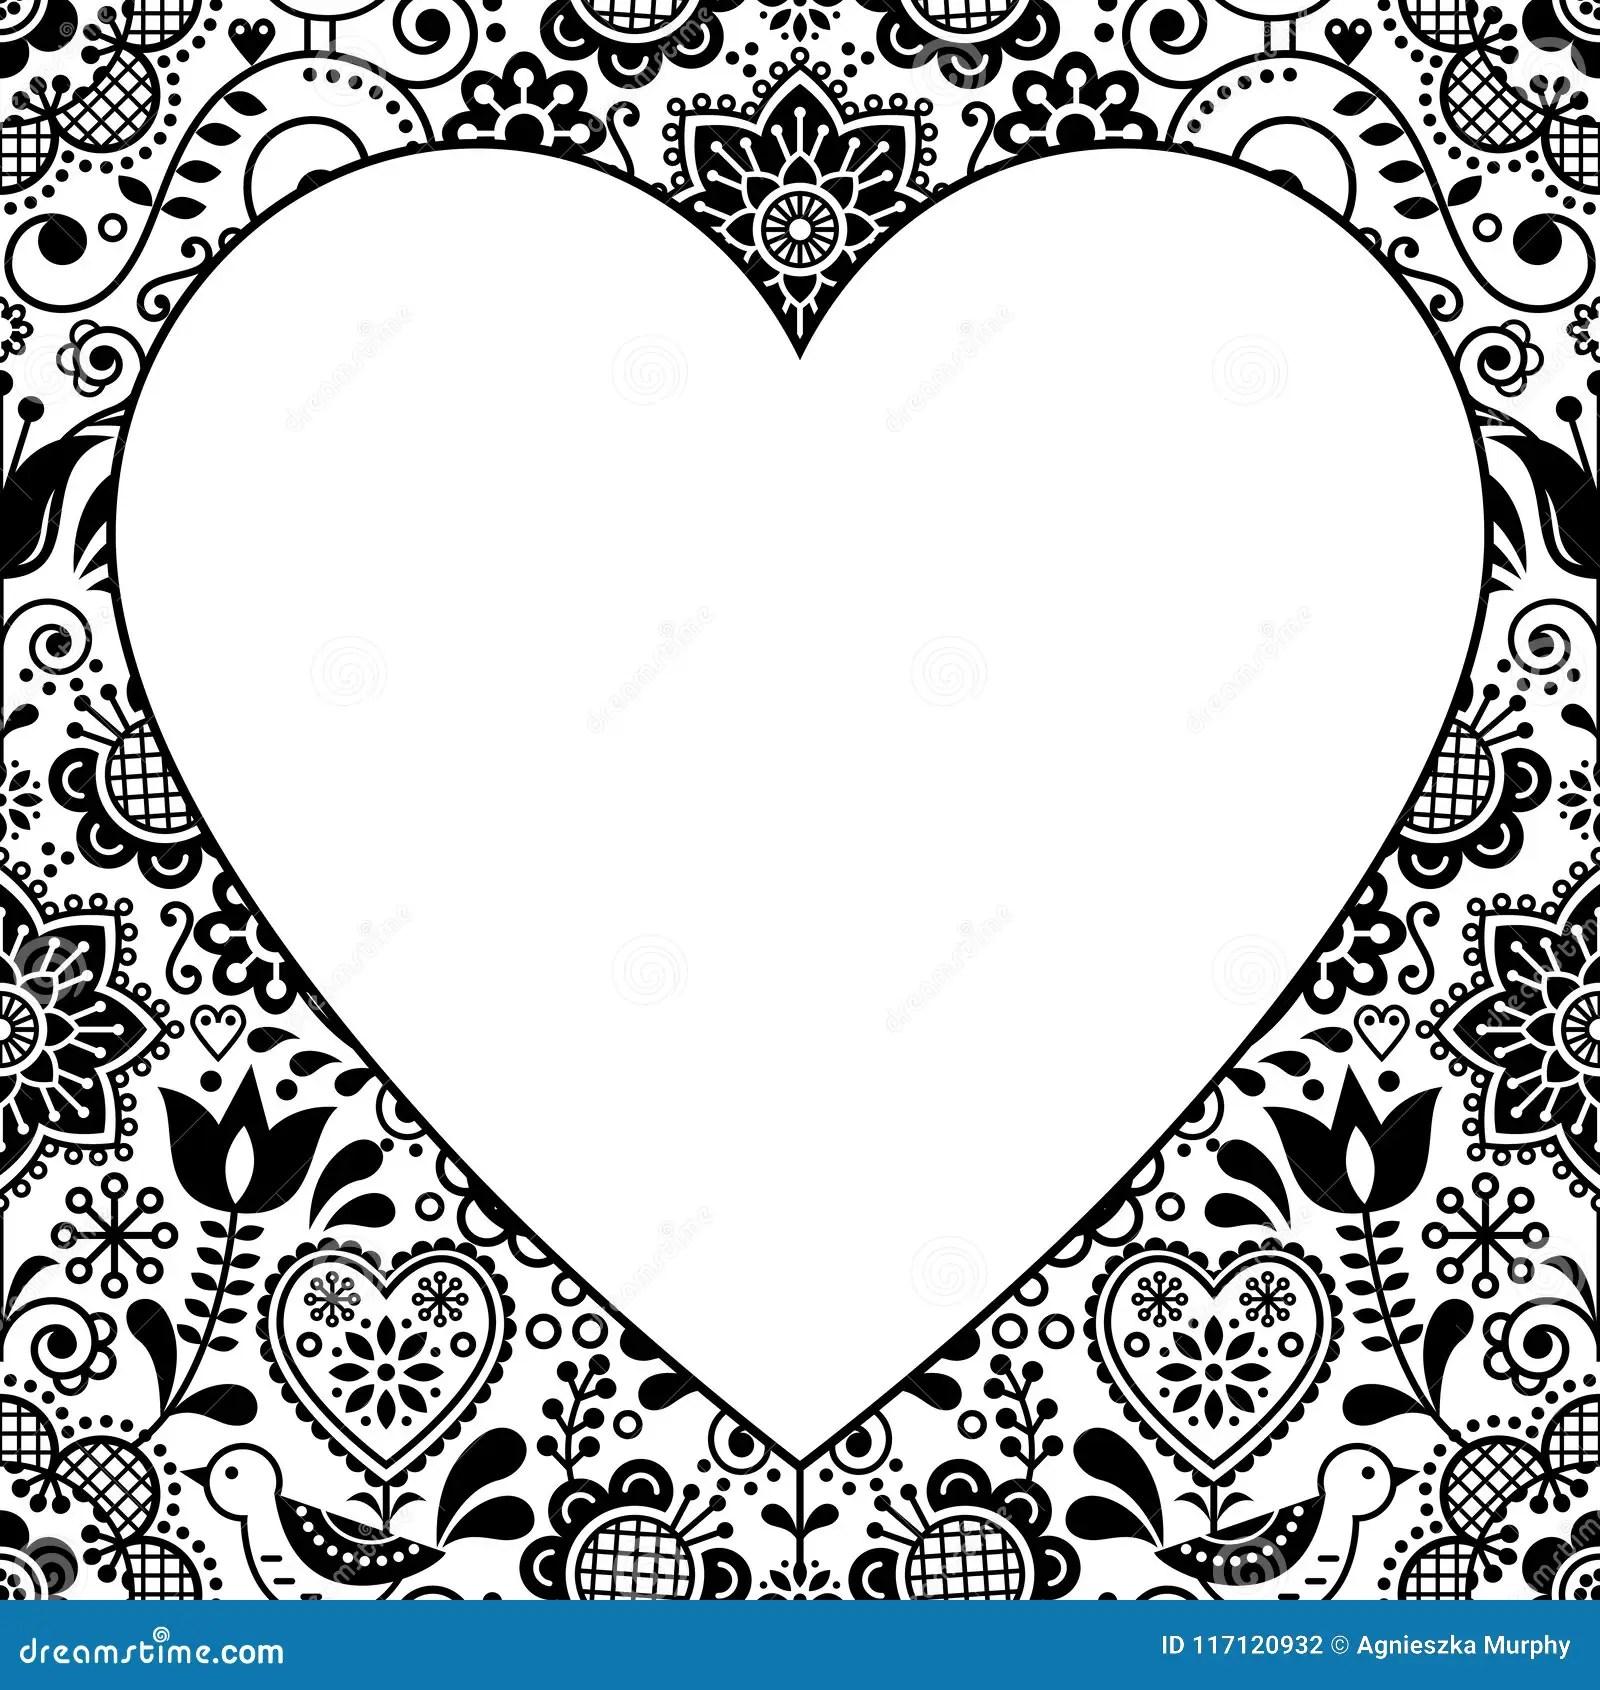 https www dreamstime com scandinavian folk heart design greeting card birthday wedding invitation floral vector pattern black white retro image117120932